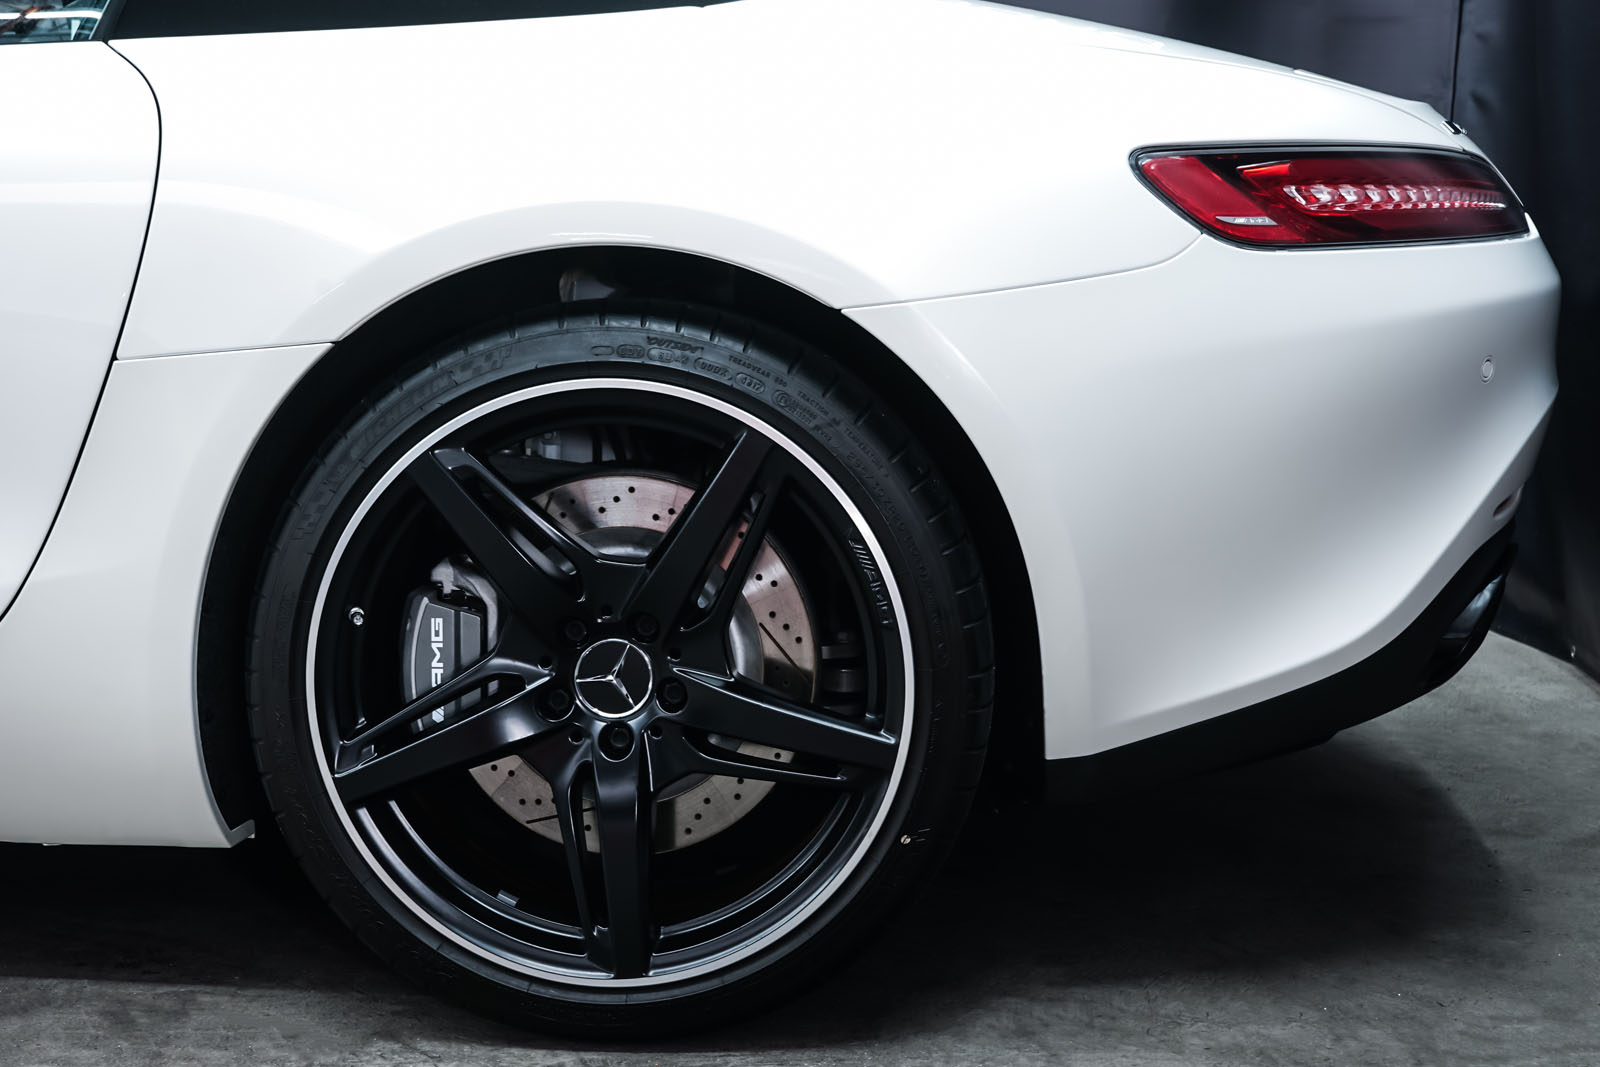 11Mercedes_Benz_AMG_GT_Roadster_Weiss_Schwarz_MB-9710_4_w